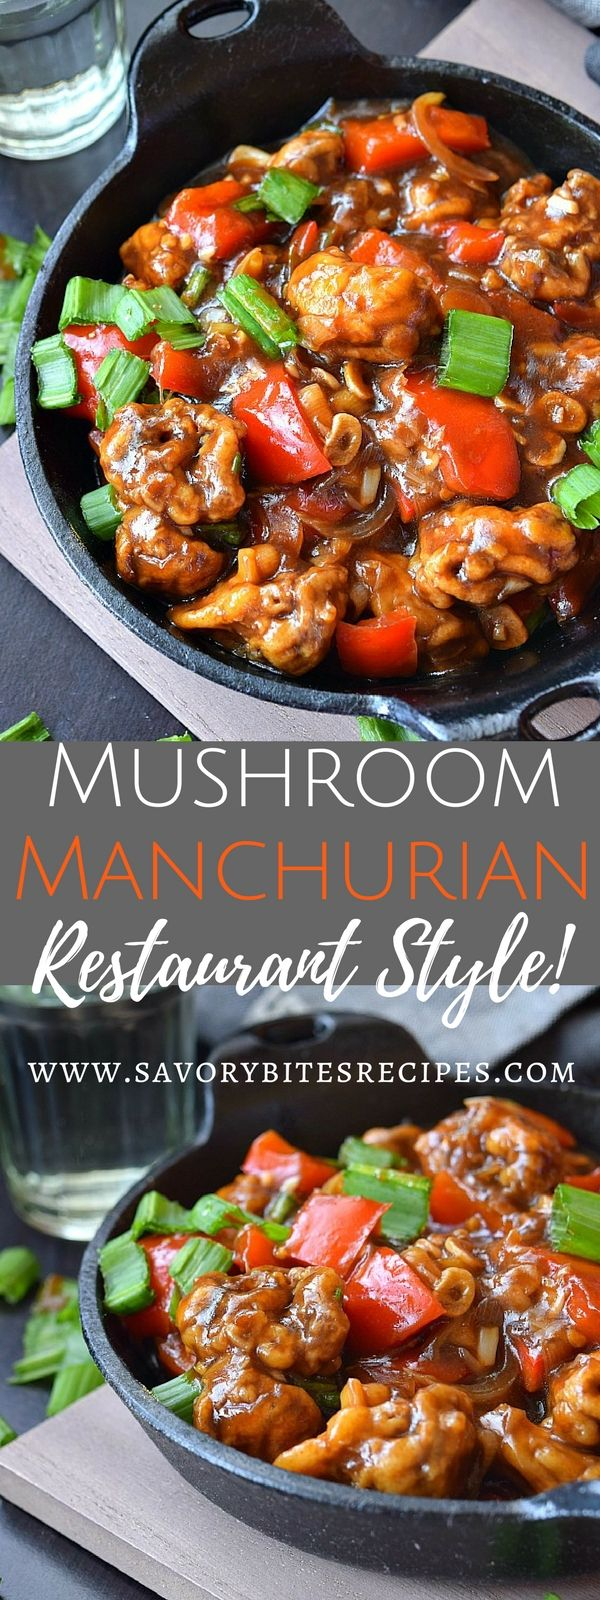 Restaurant style Mushroom Manchurian under 30mins! #easy #recipe #chinese #food